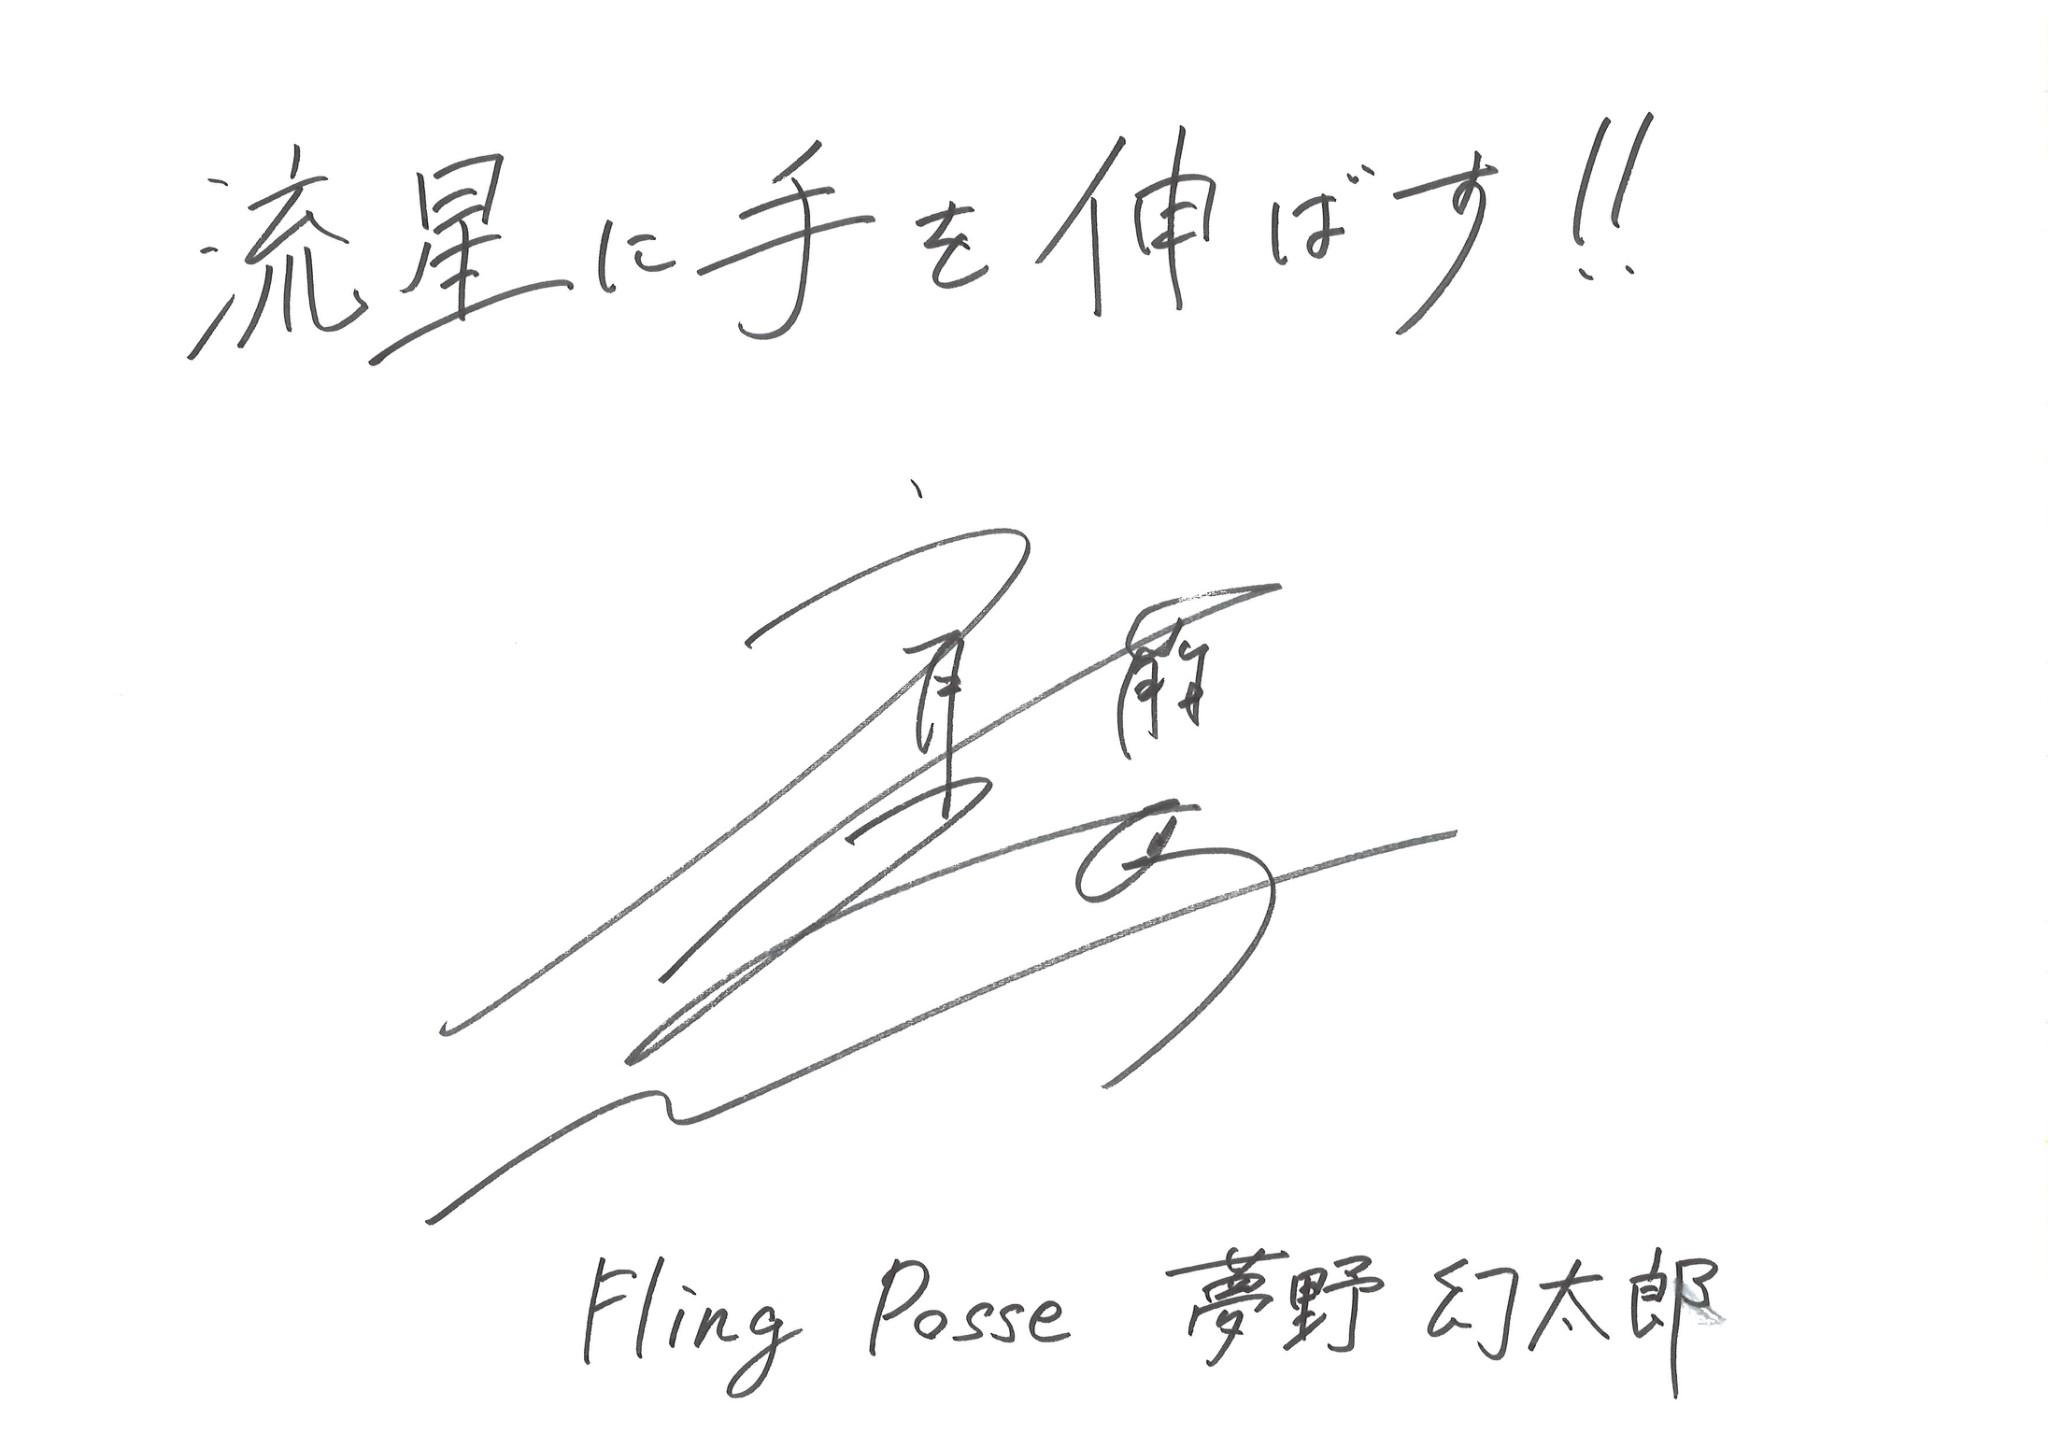 夢野幻太郎(CV:斉藤壮馬) (C) King Record Co., Ltd. All rights reserved.